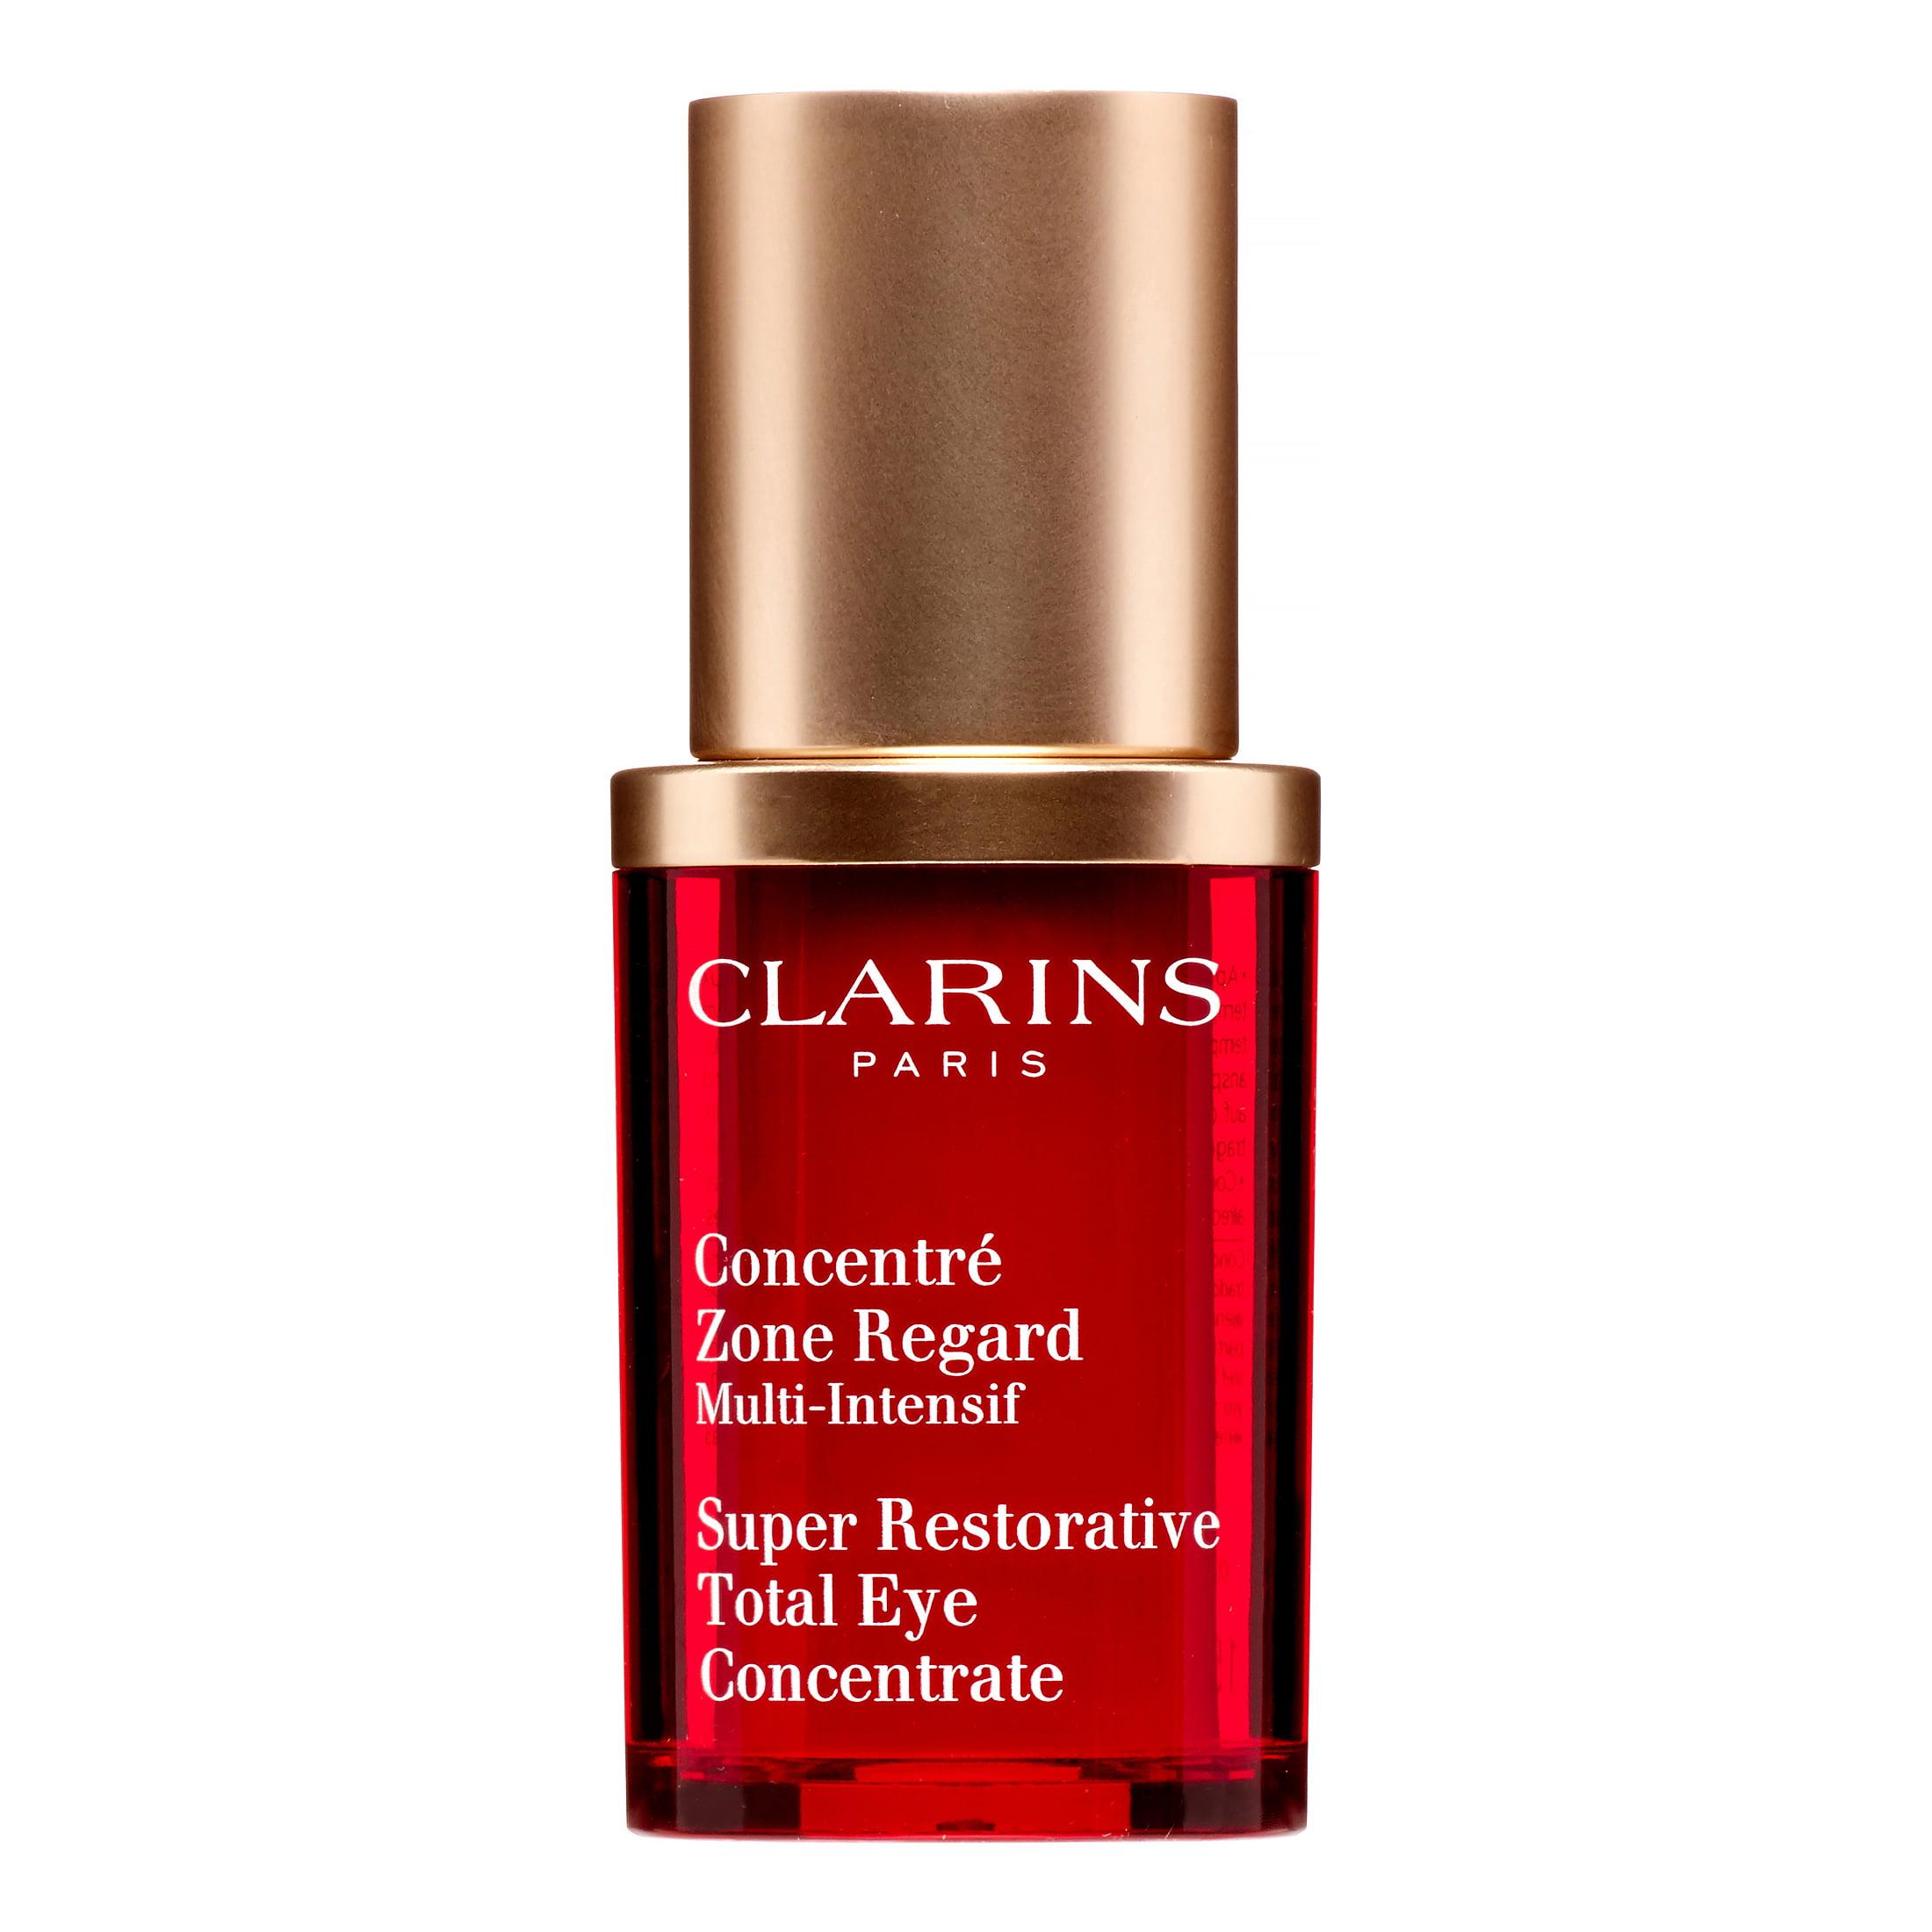 Clarins Super Restorative Total Eye Concentrate, 0.5 Oz